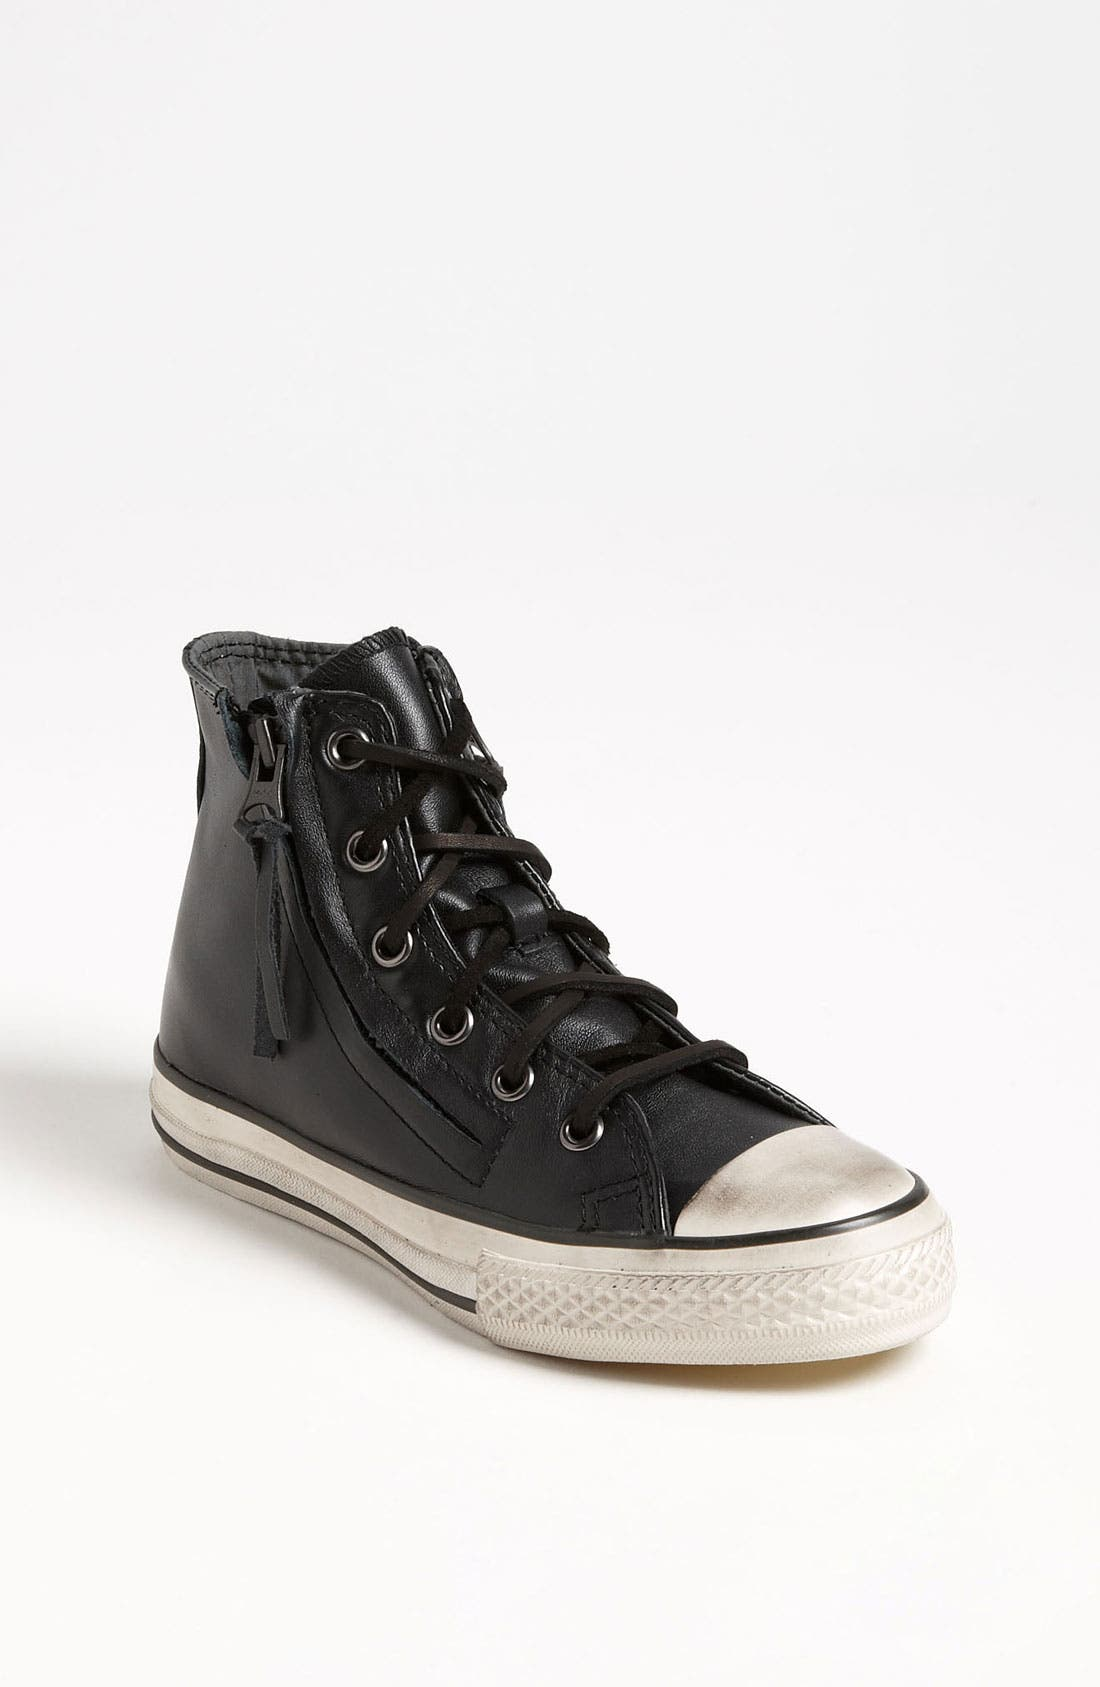 Main Image - Converse by John Varvatos 'Double Zip' High Top Sneaker (Toddler, Little Kid & Big Kid)